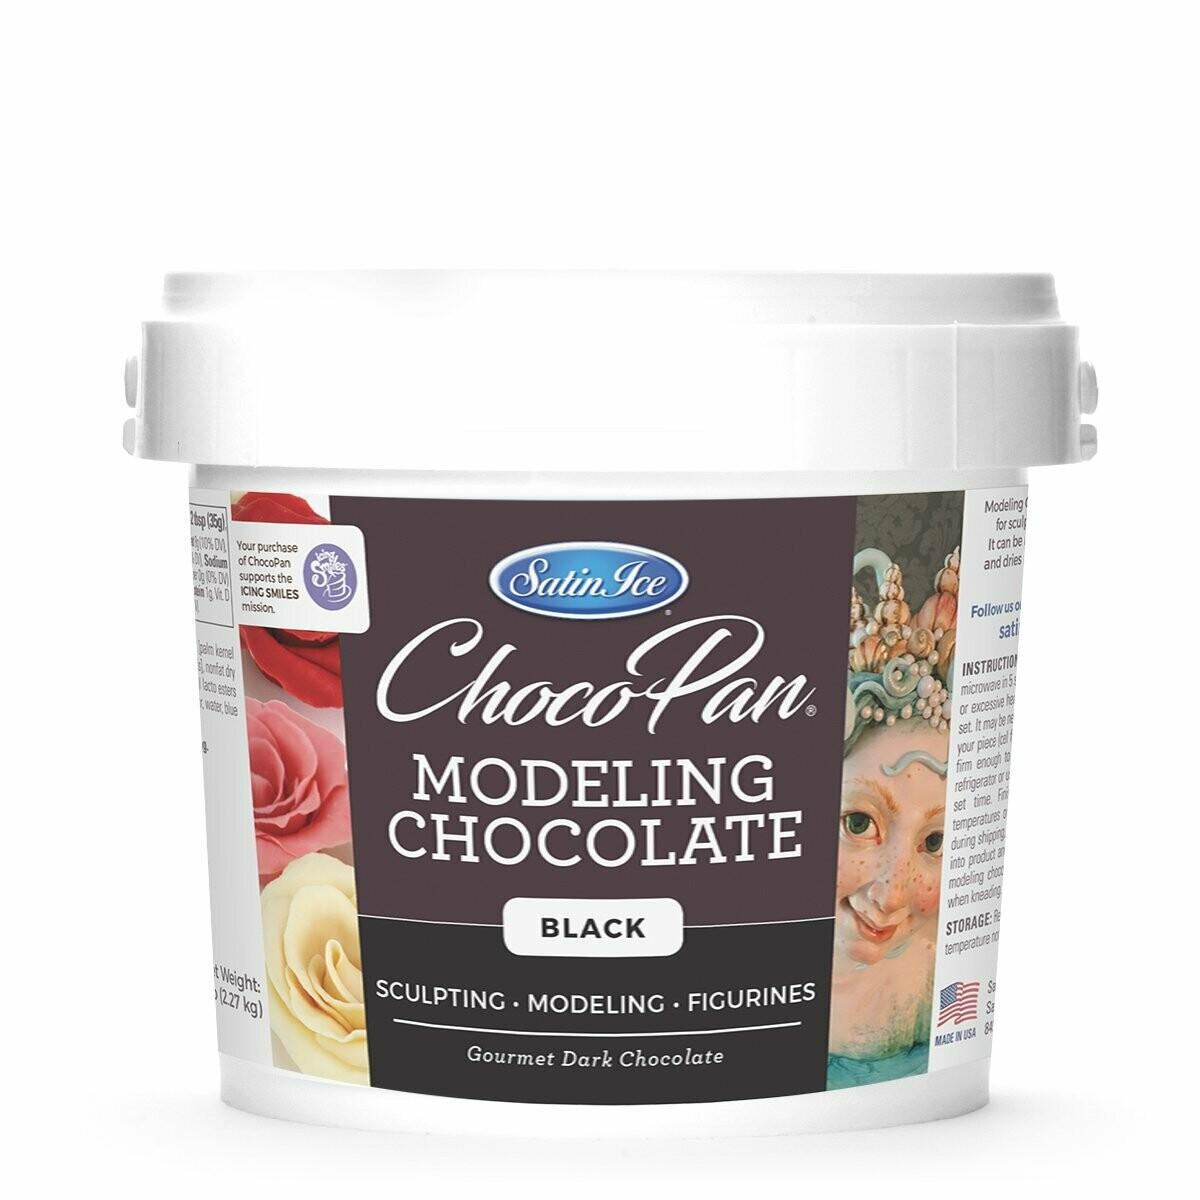 ChocoPan Modeling Chocolate 5lb Black